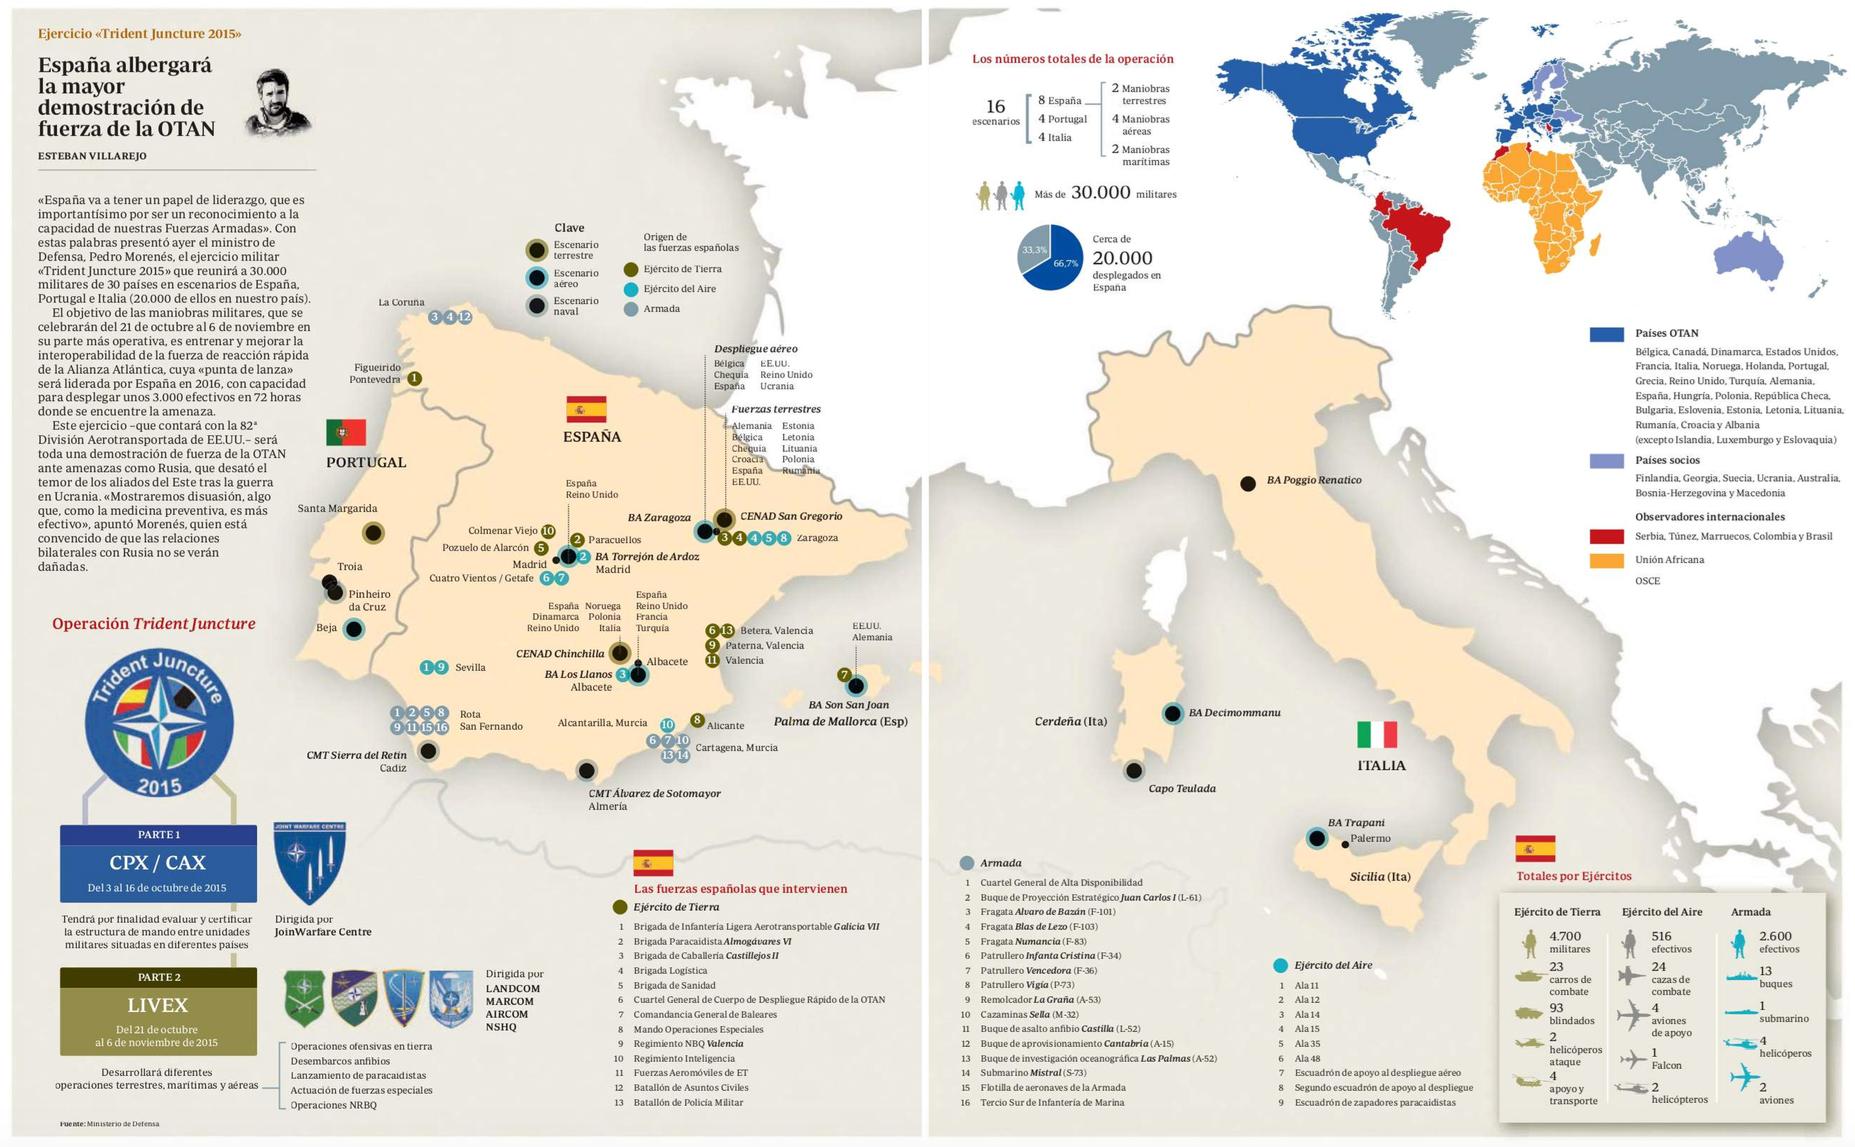 Se viene la tercer Guerra mundial a fin de año Segun la OTAN Operation-Trident-Juncture